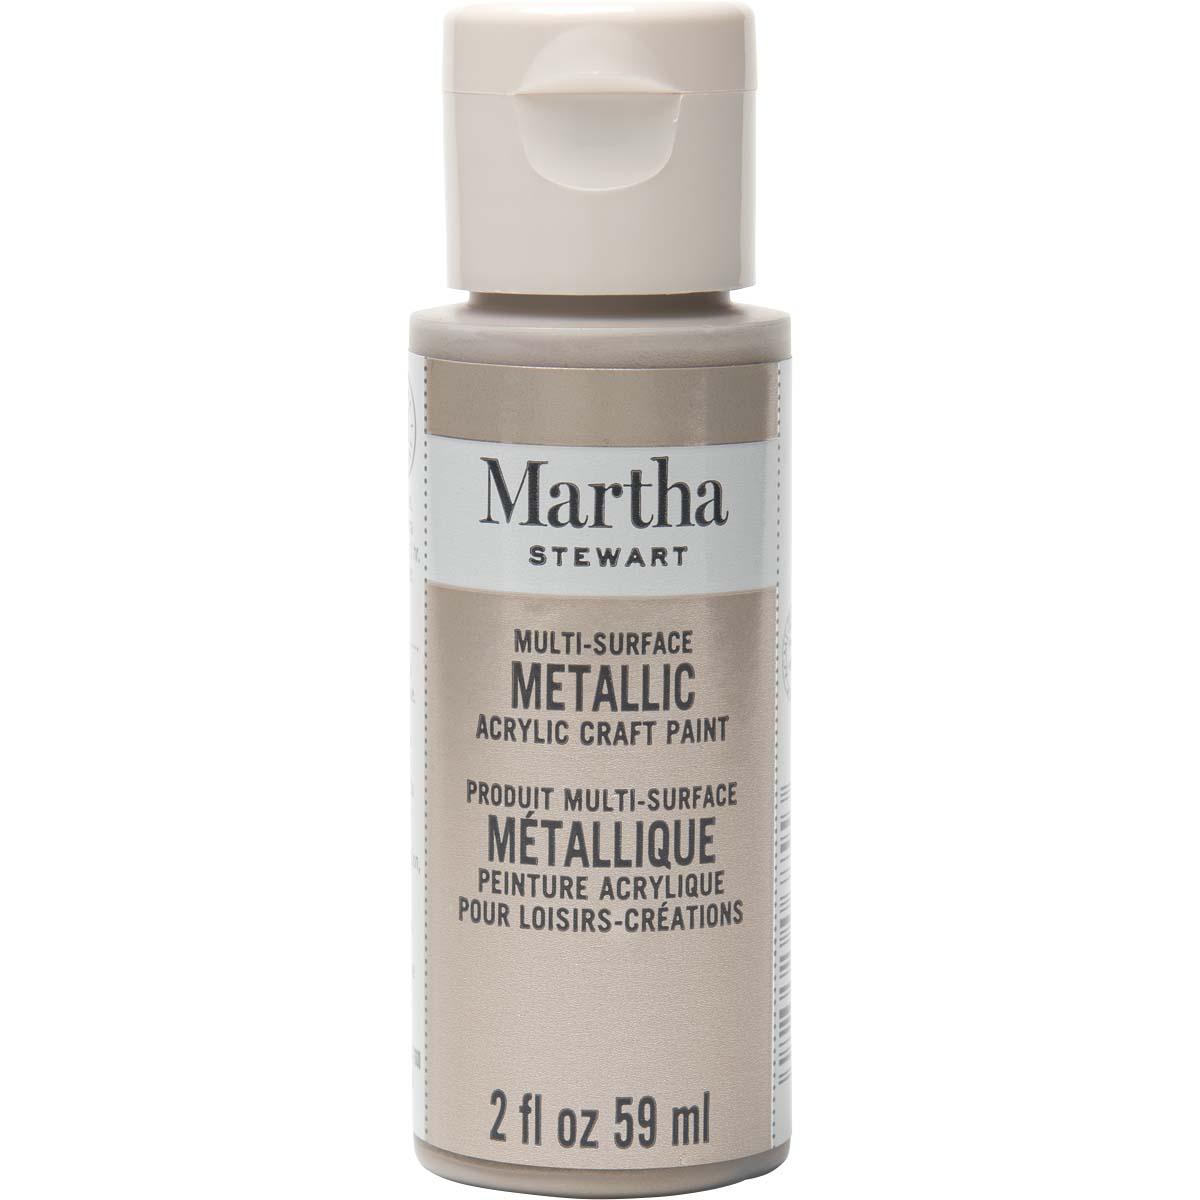 Martha Stewart® 2oz Multi-Surface Metallic Acrylic Craft Paint - Champagne